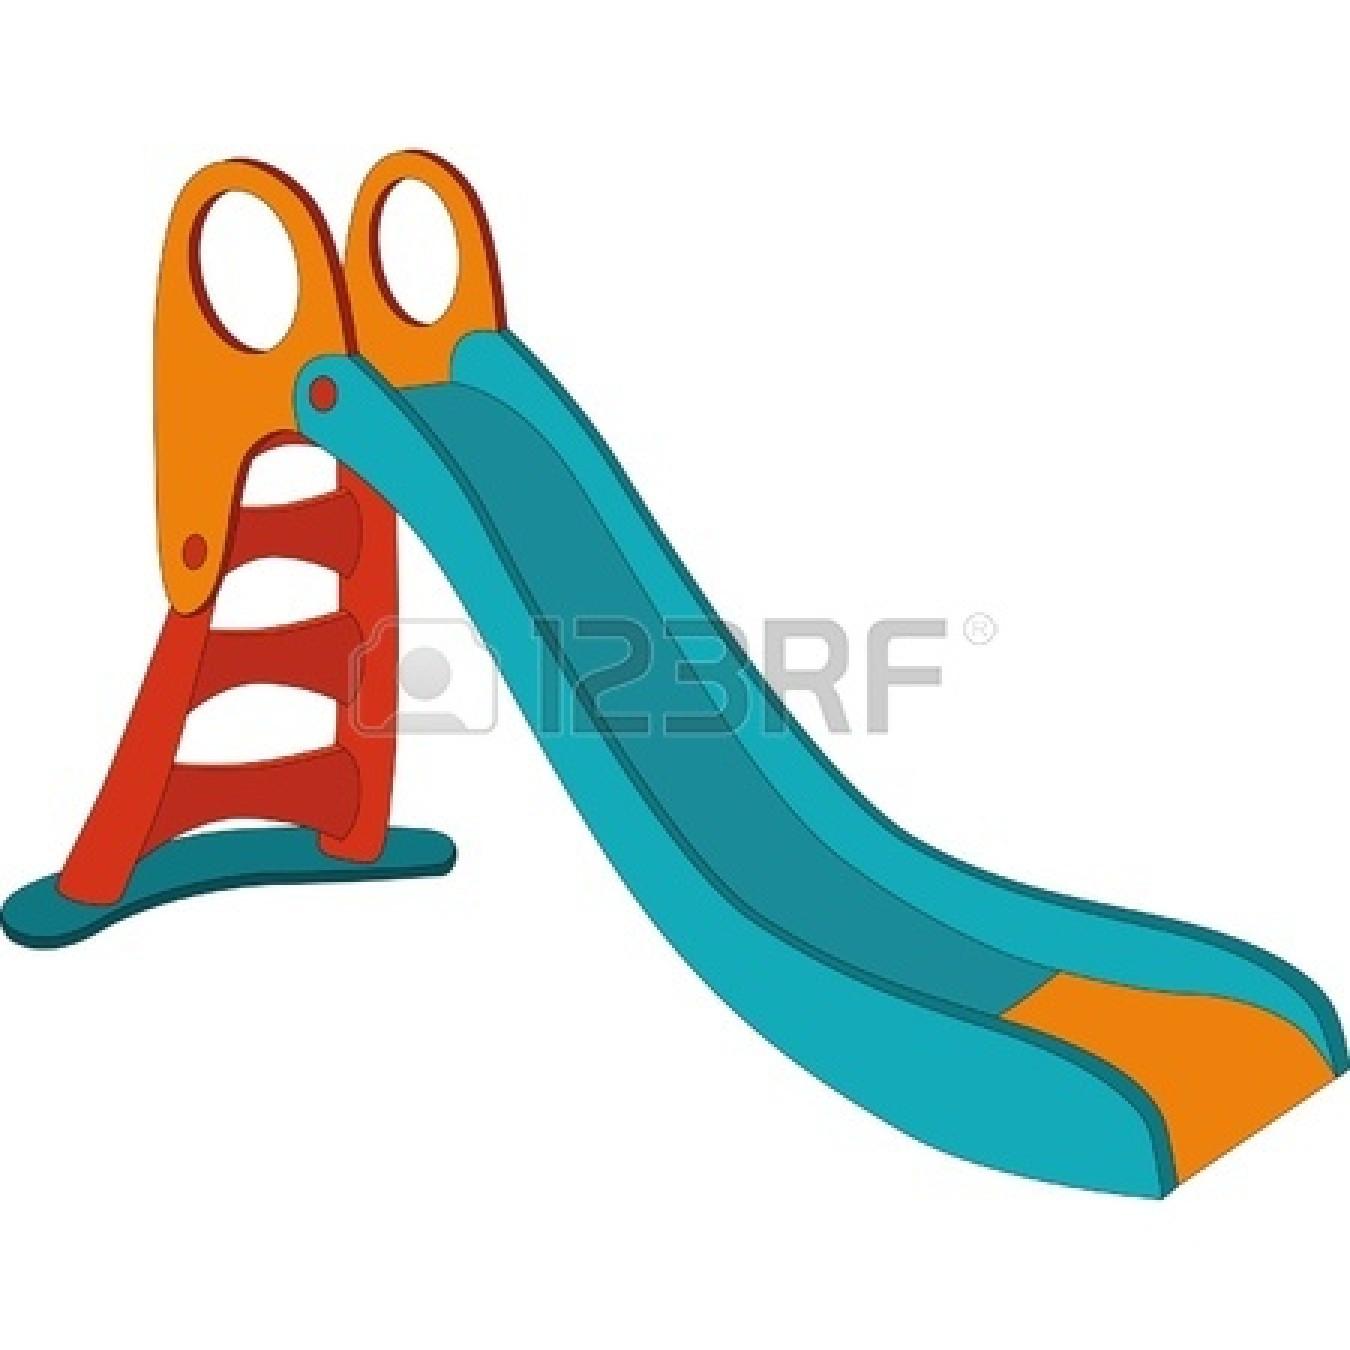 Playground clipart adventure playground #9